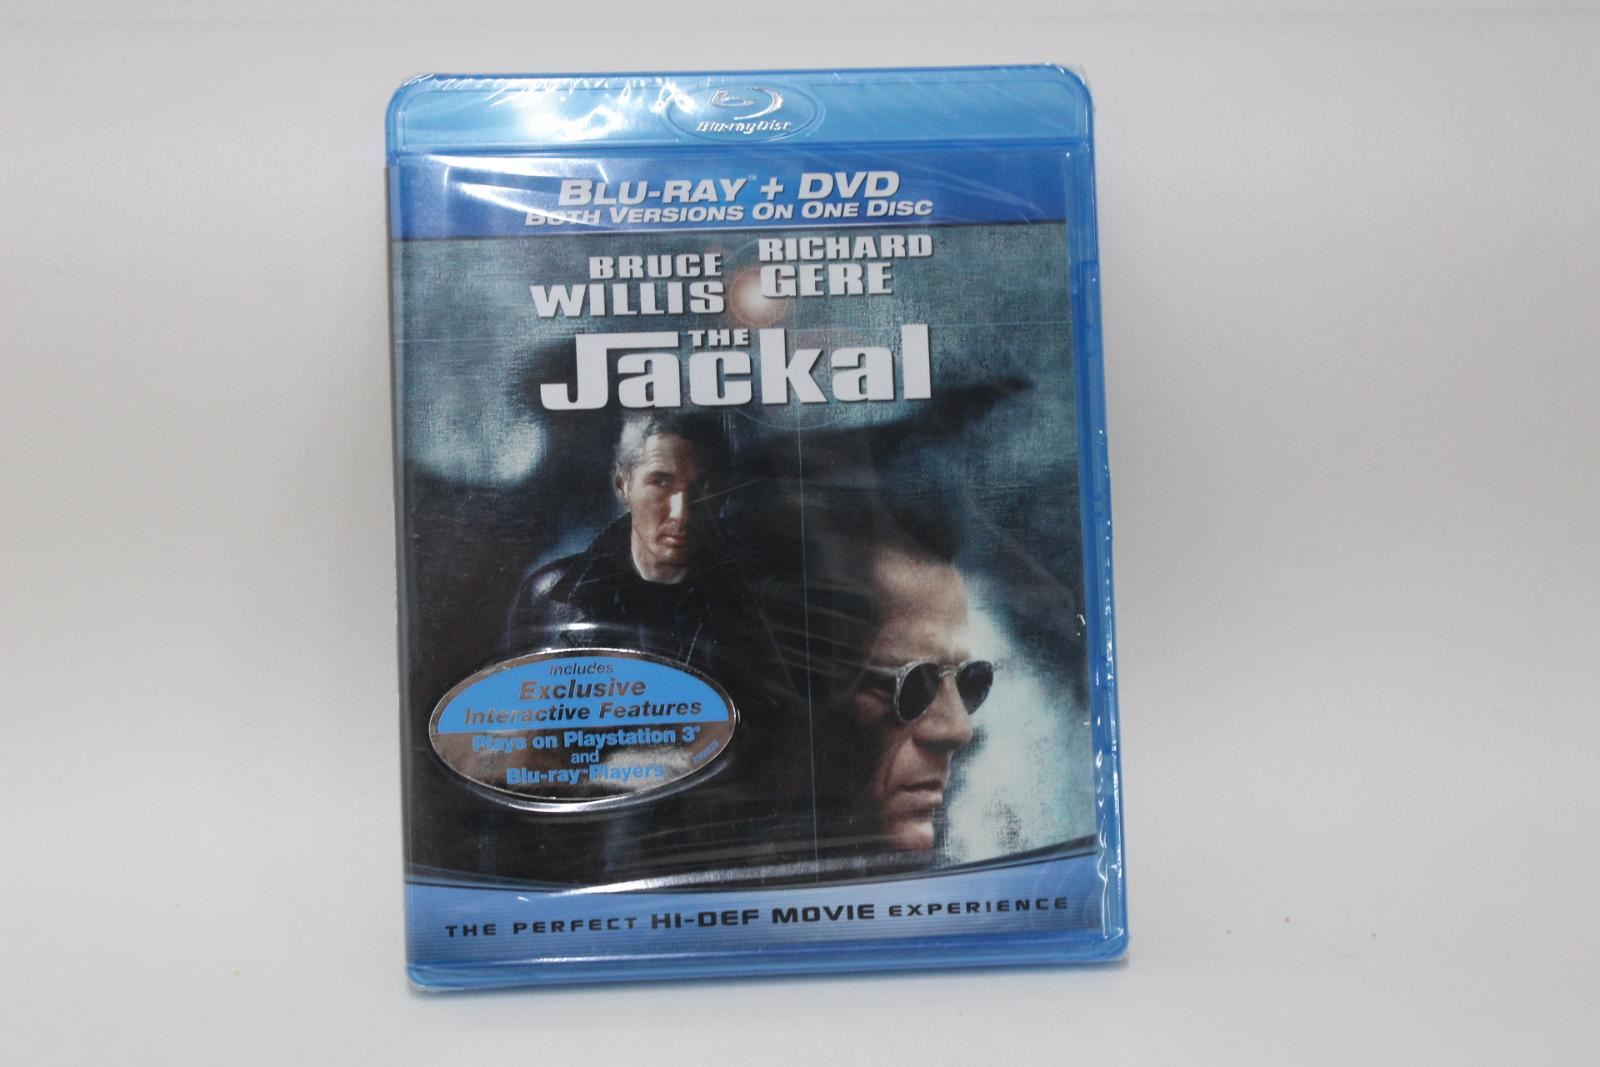 THE-JACKAL-Blu-ray-amp-DVD-2010-Bruce-Willis-Richard-Gere-Action-Movie-Sealed